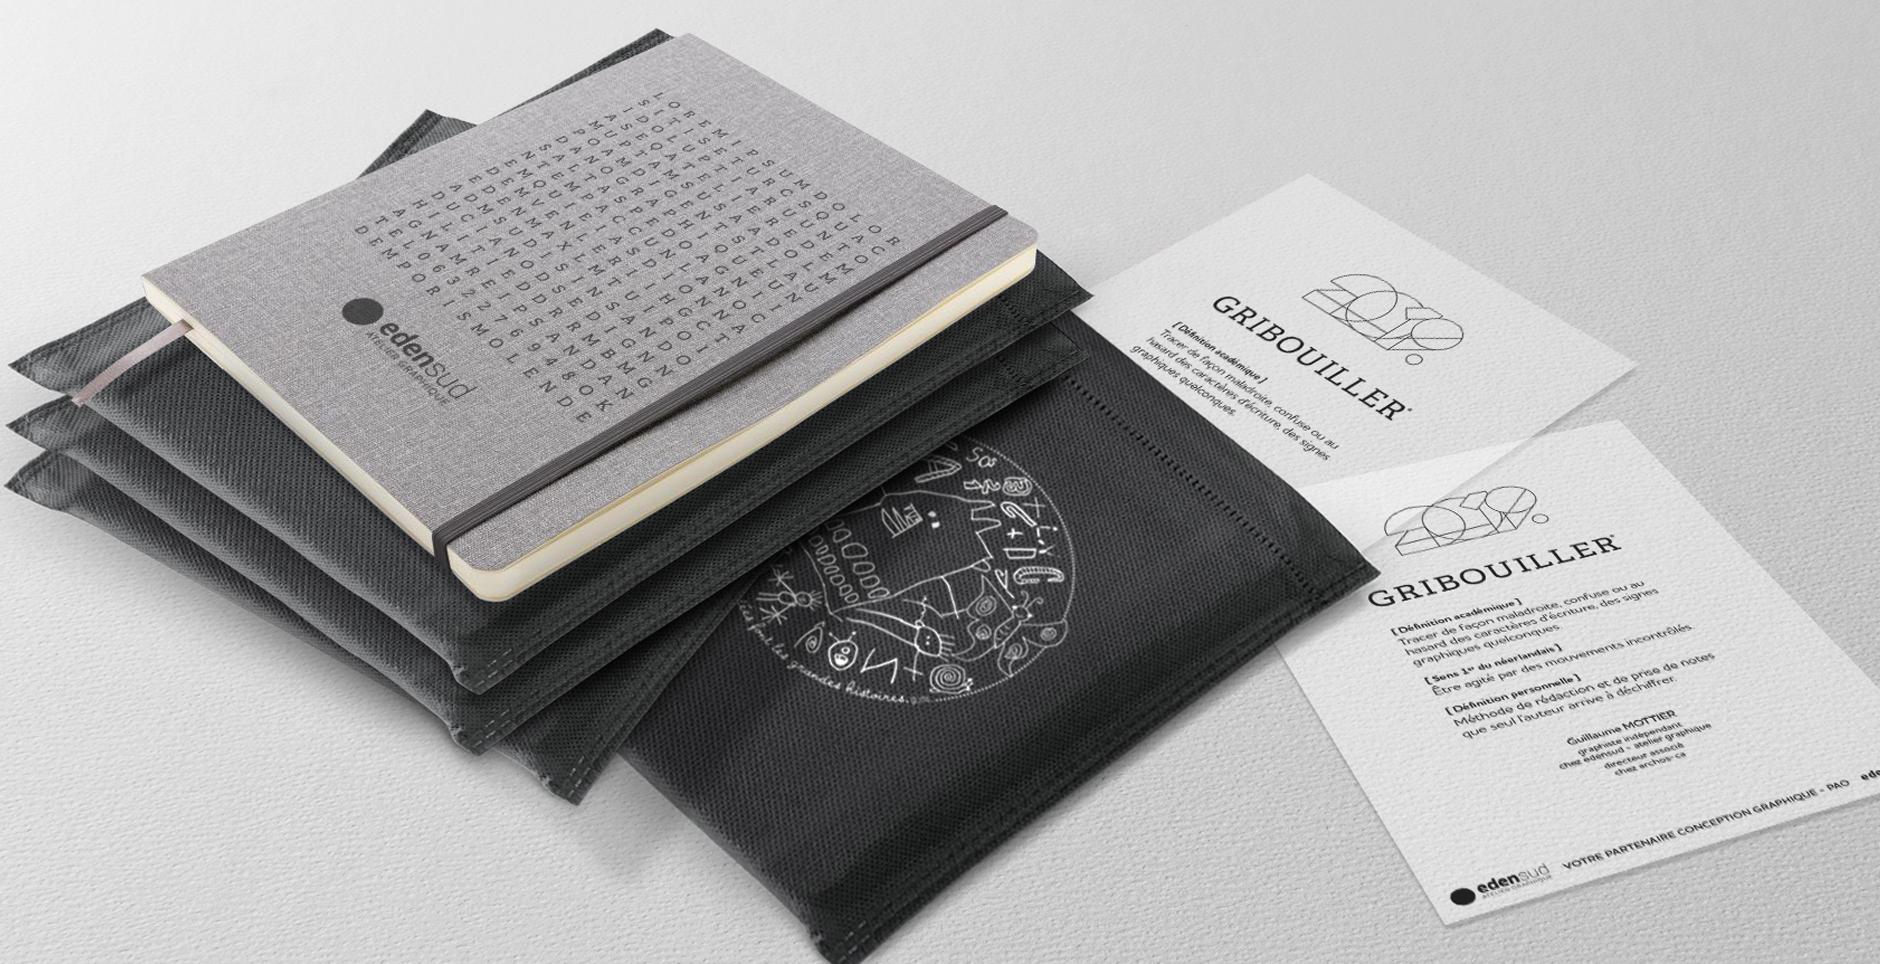 EDENSUD - Support de fin d'année